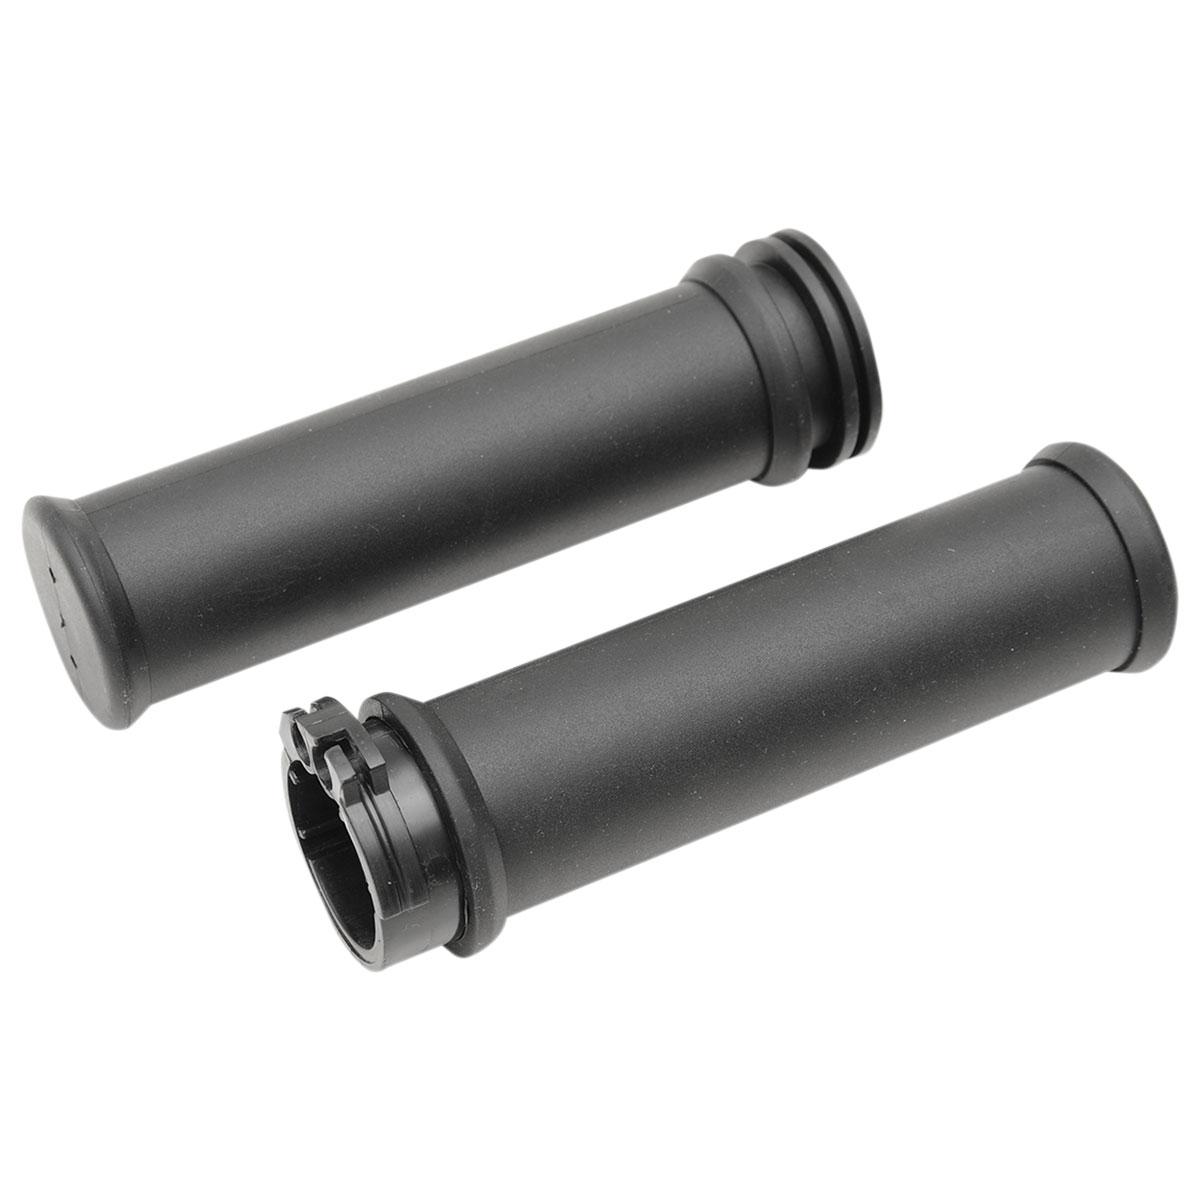 Drag Specialties OEM Style Reduced Diameter Rubber Grip Set